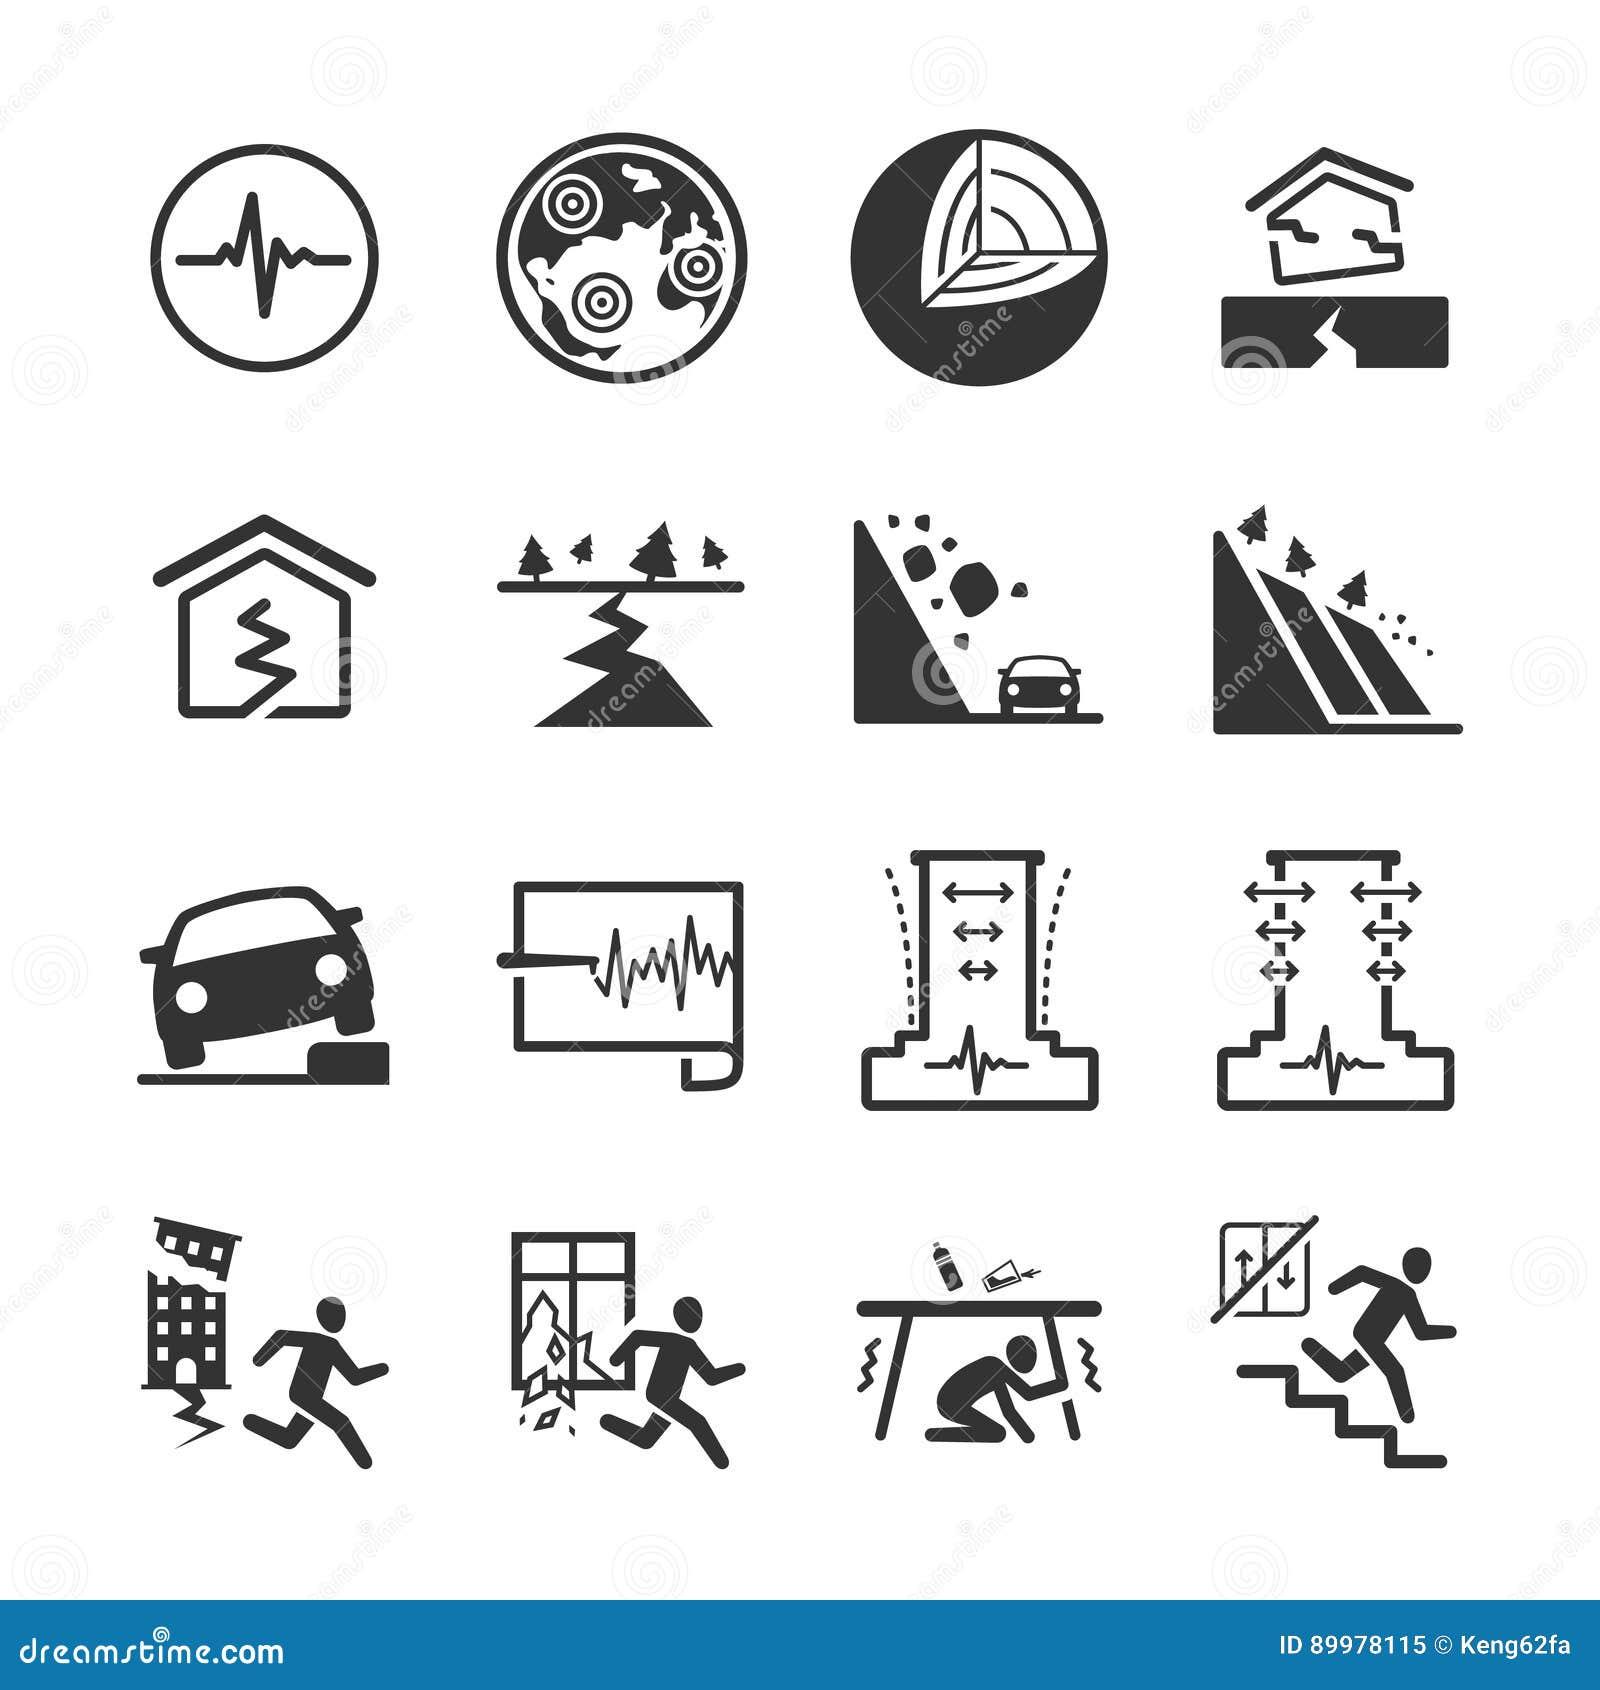 Earthquake and geology icons set 2